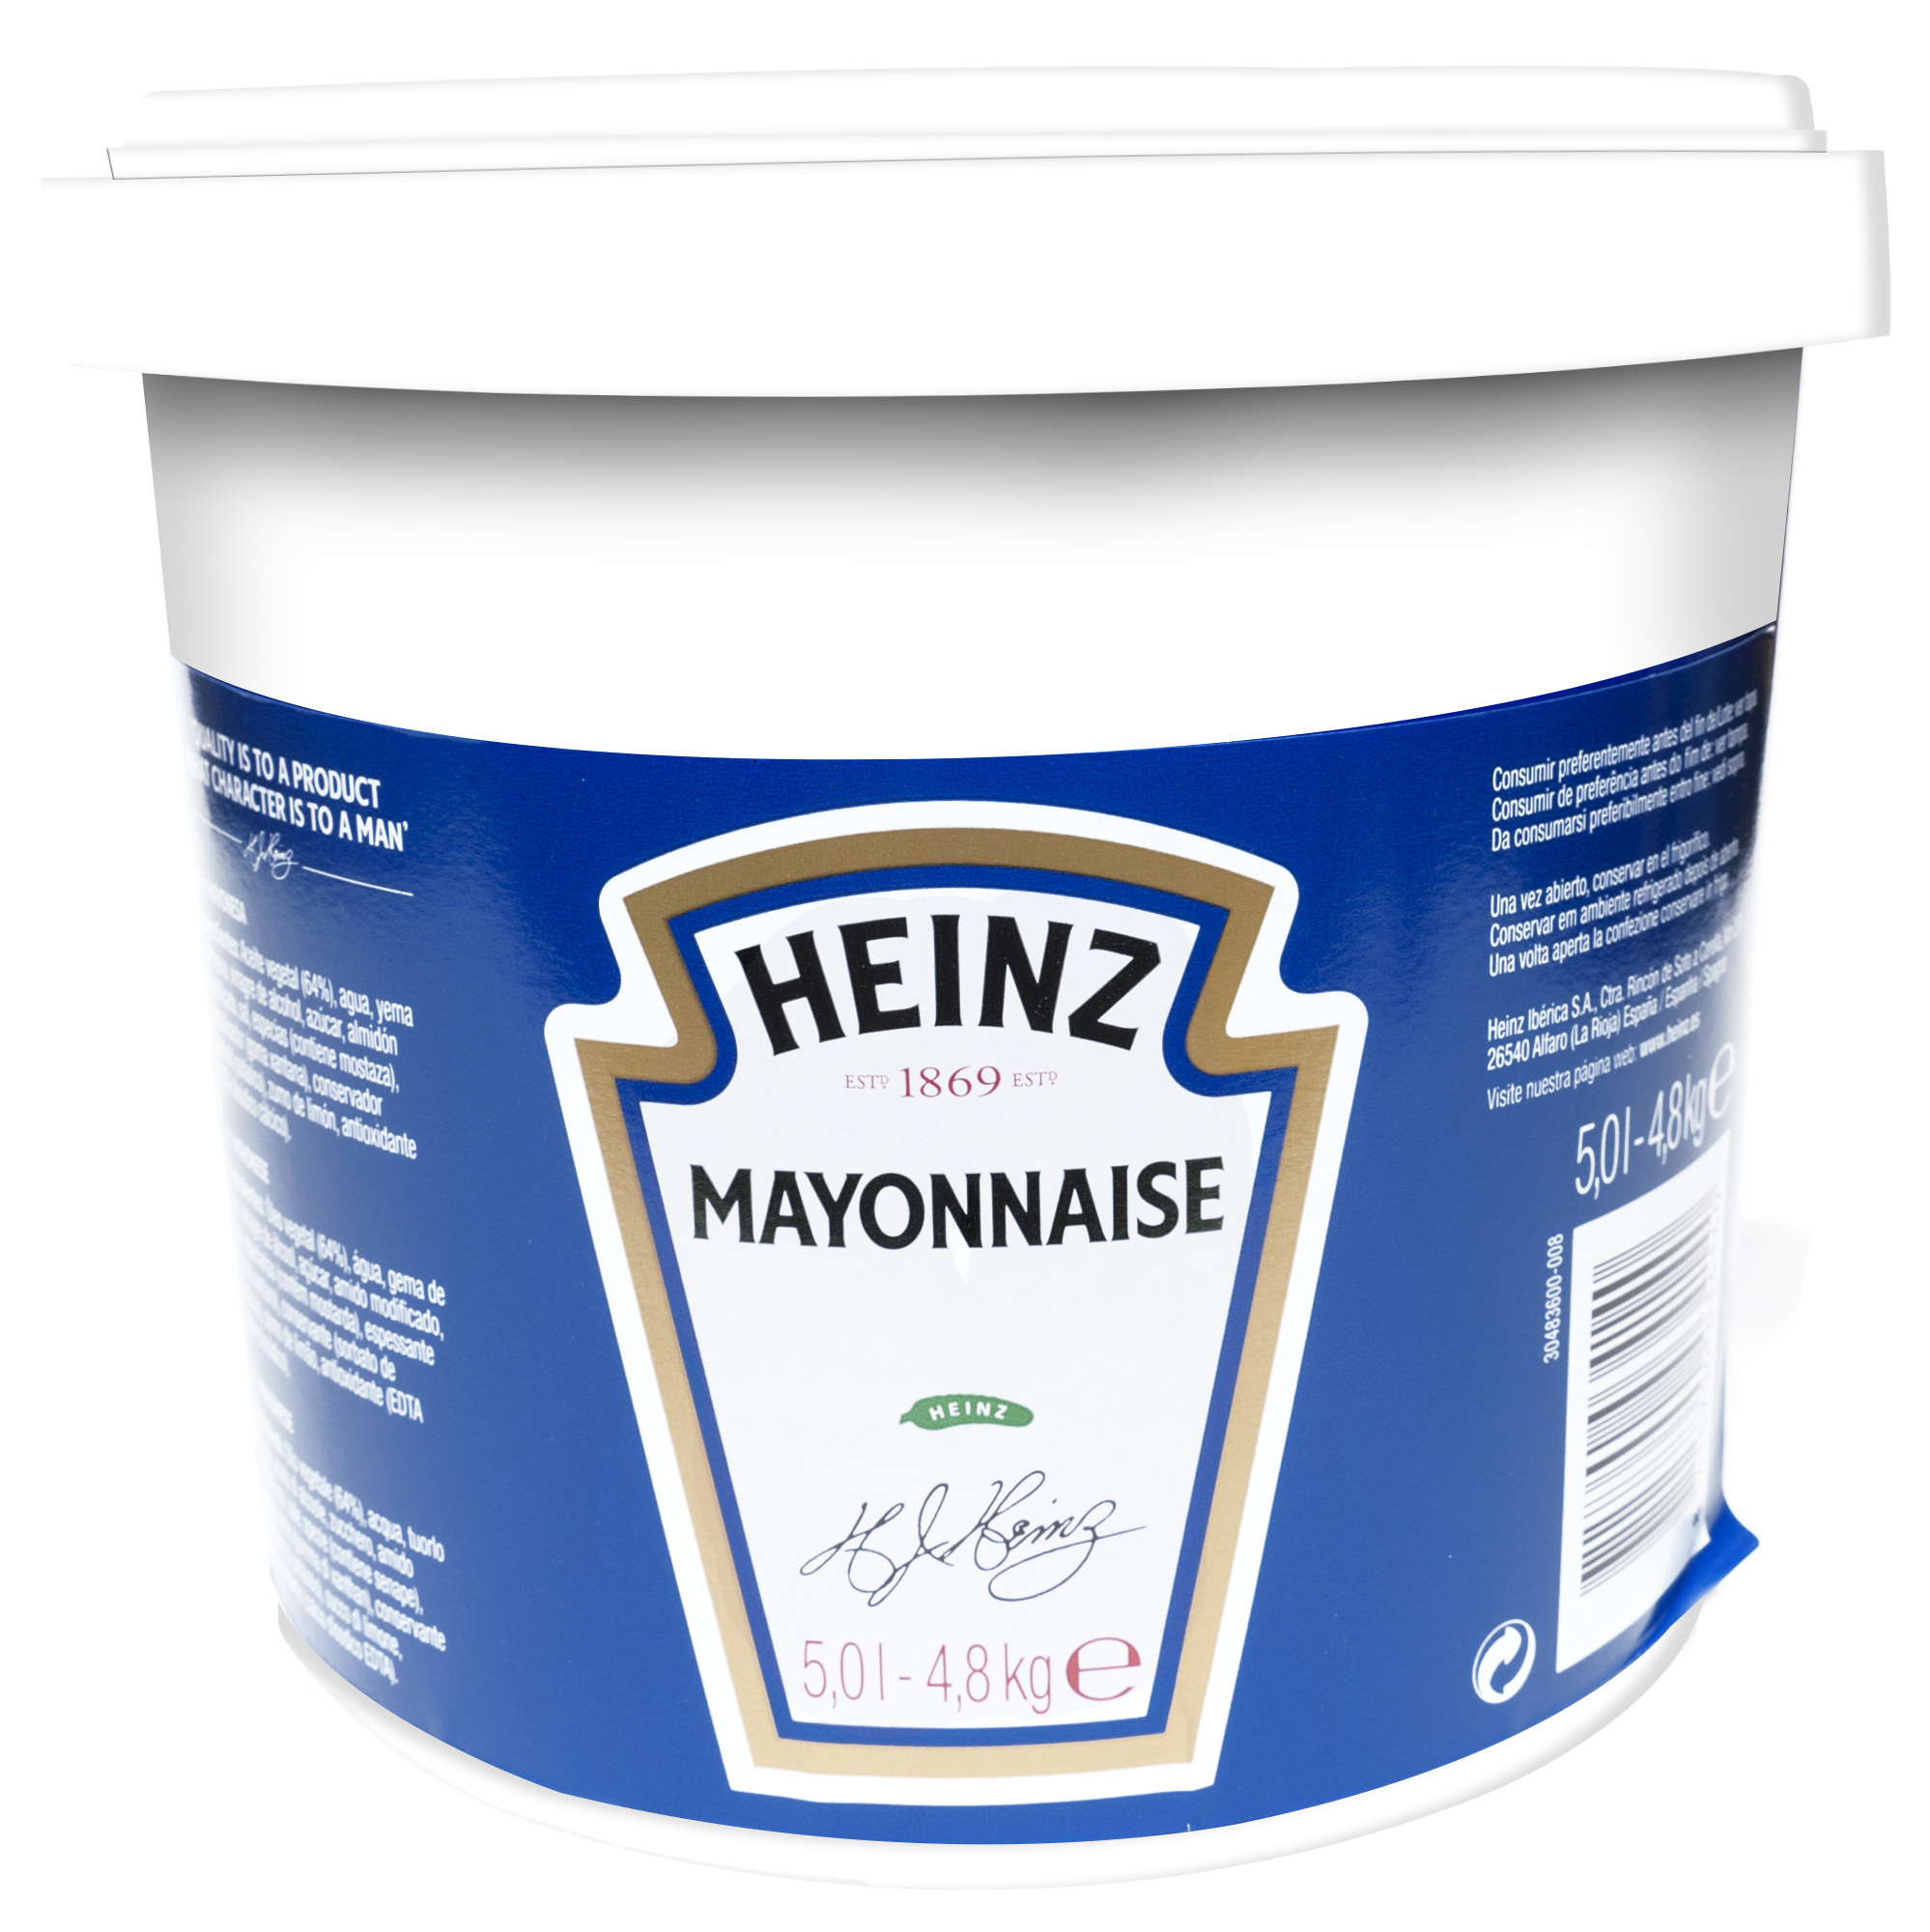 Heinz Maionese 4,8 kg Secchio image